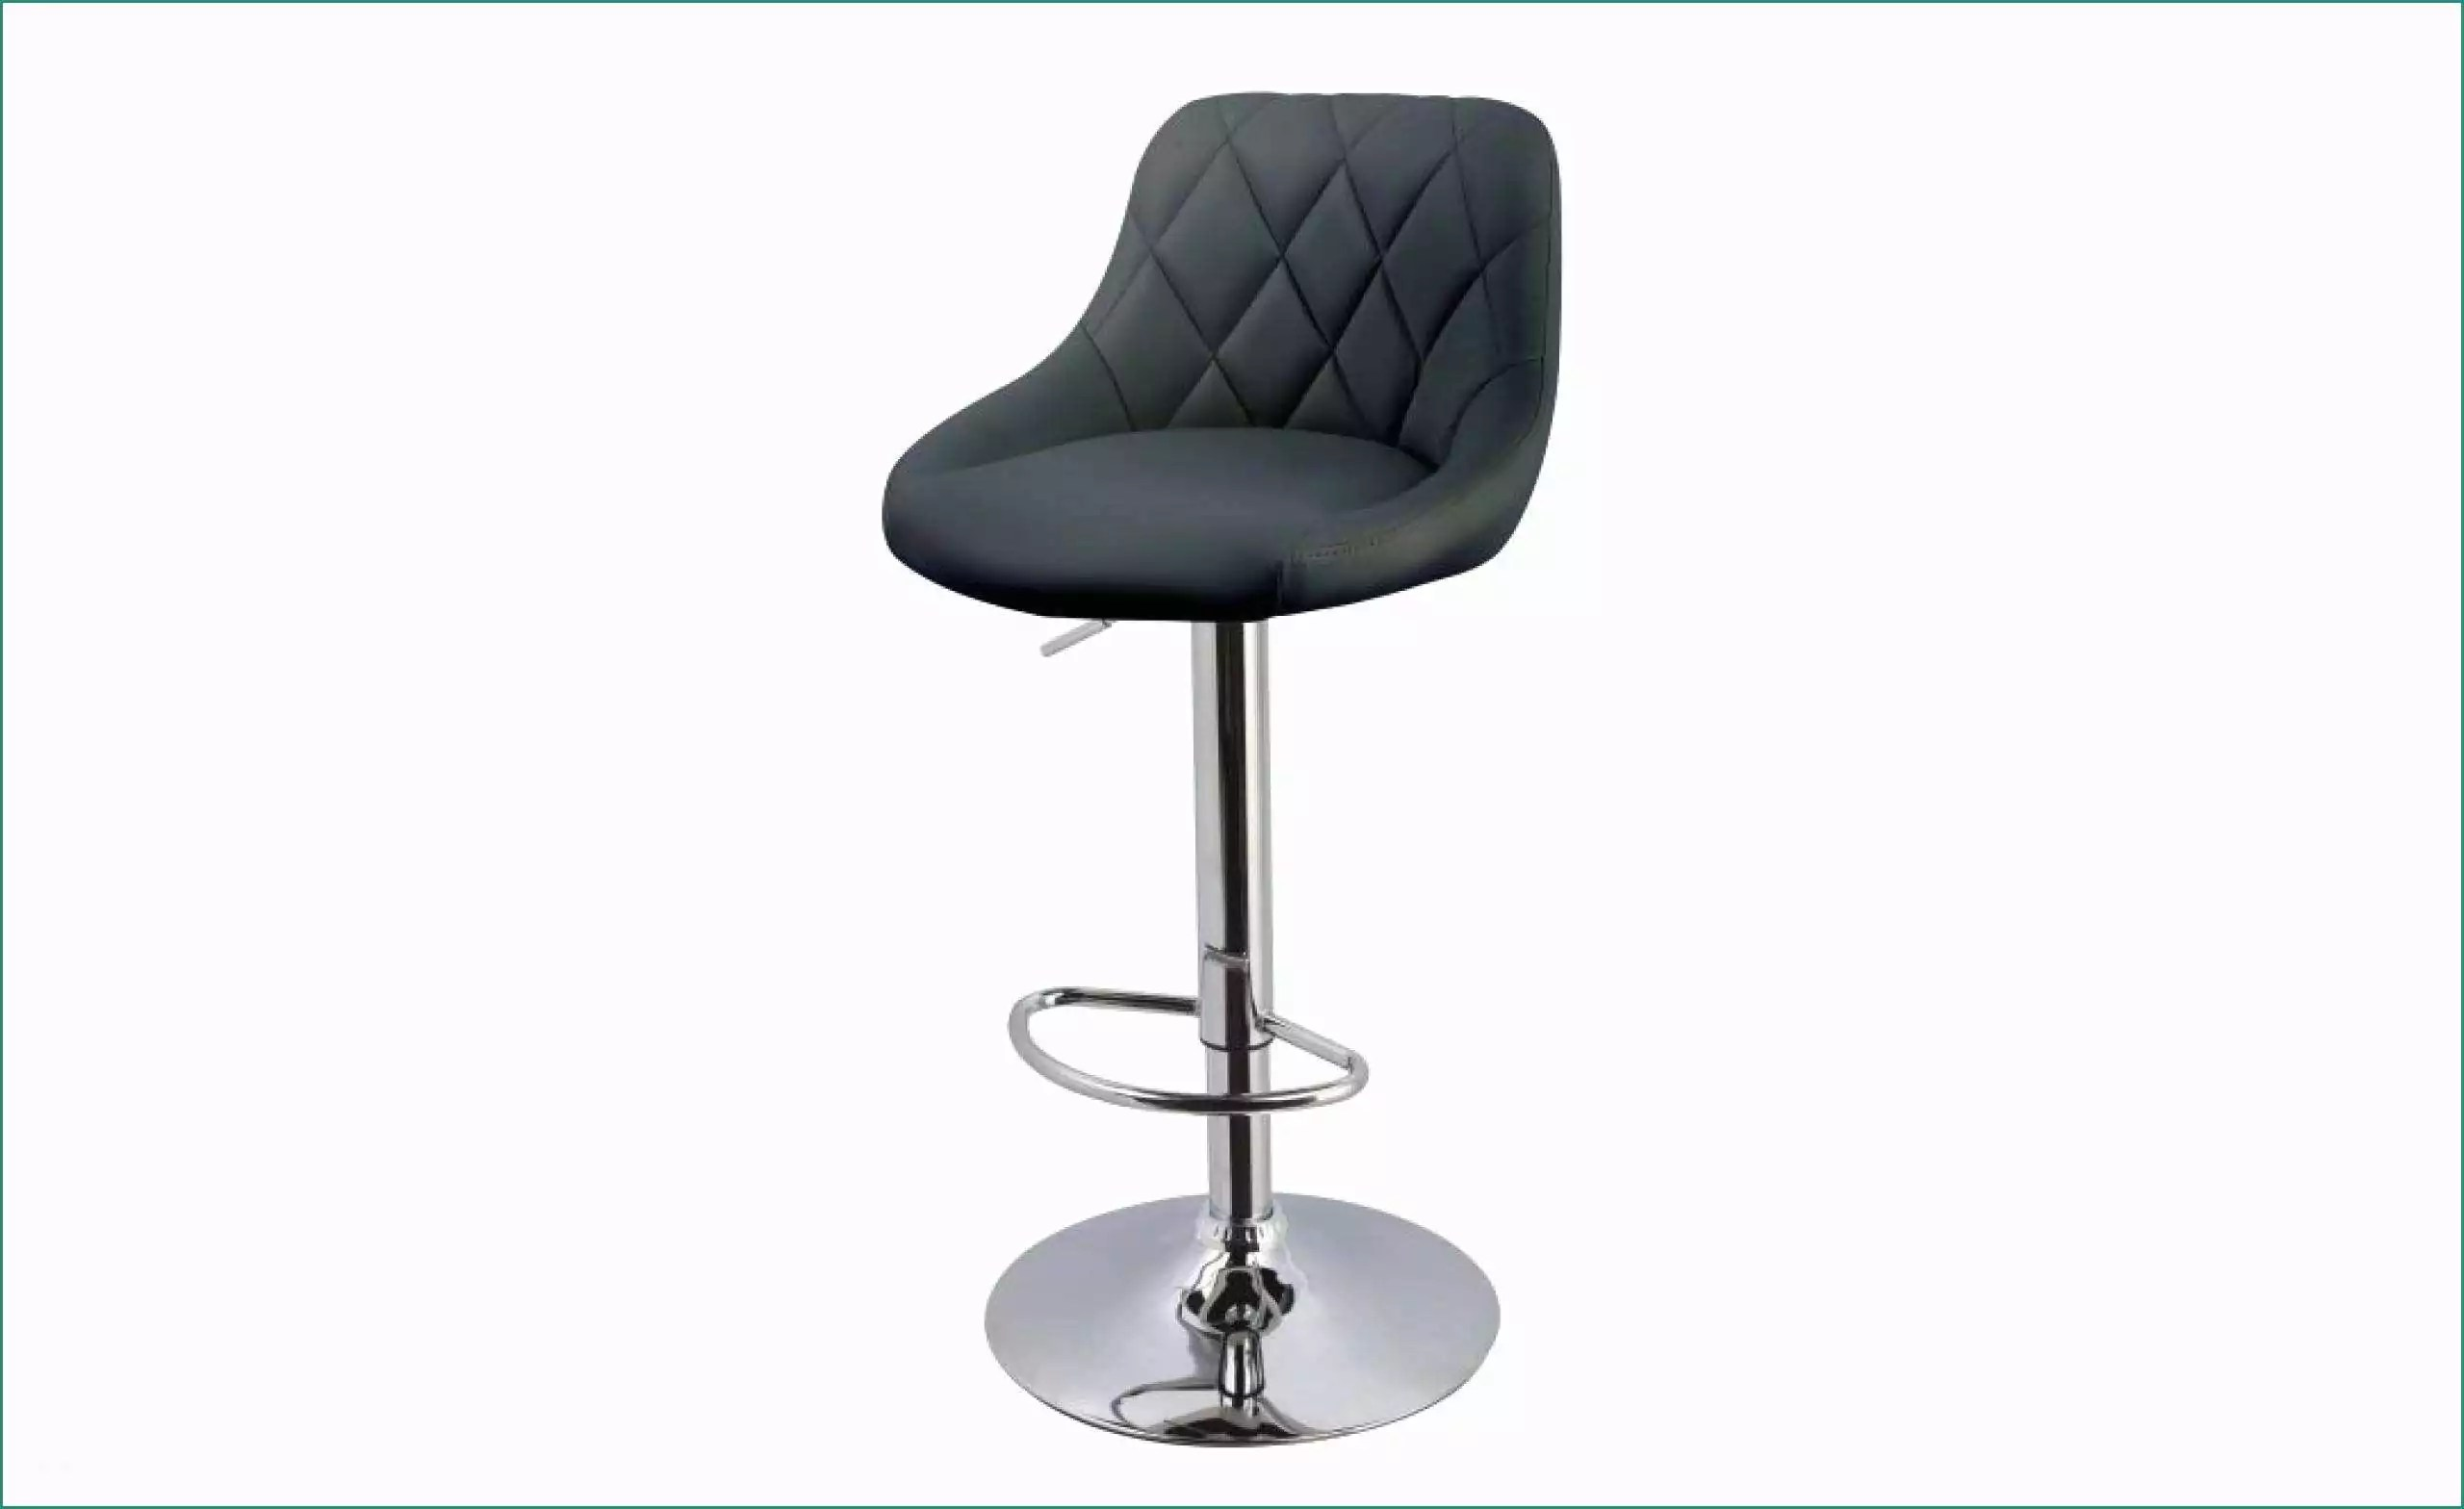 Sgabelli Per Cucina Ikea | Tavoli Bimbi Ikea Top Cucina Leroy Merlin ...